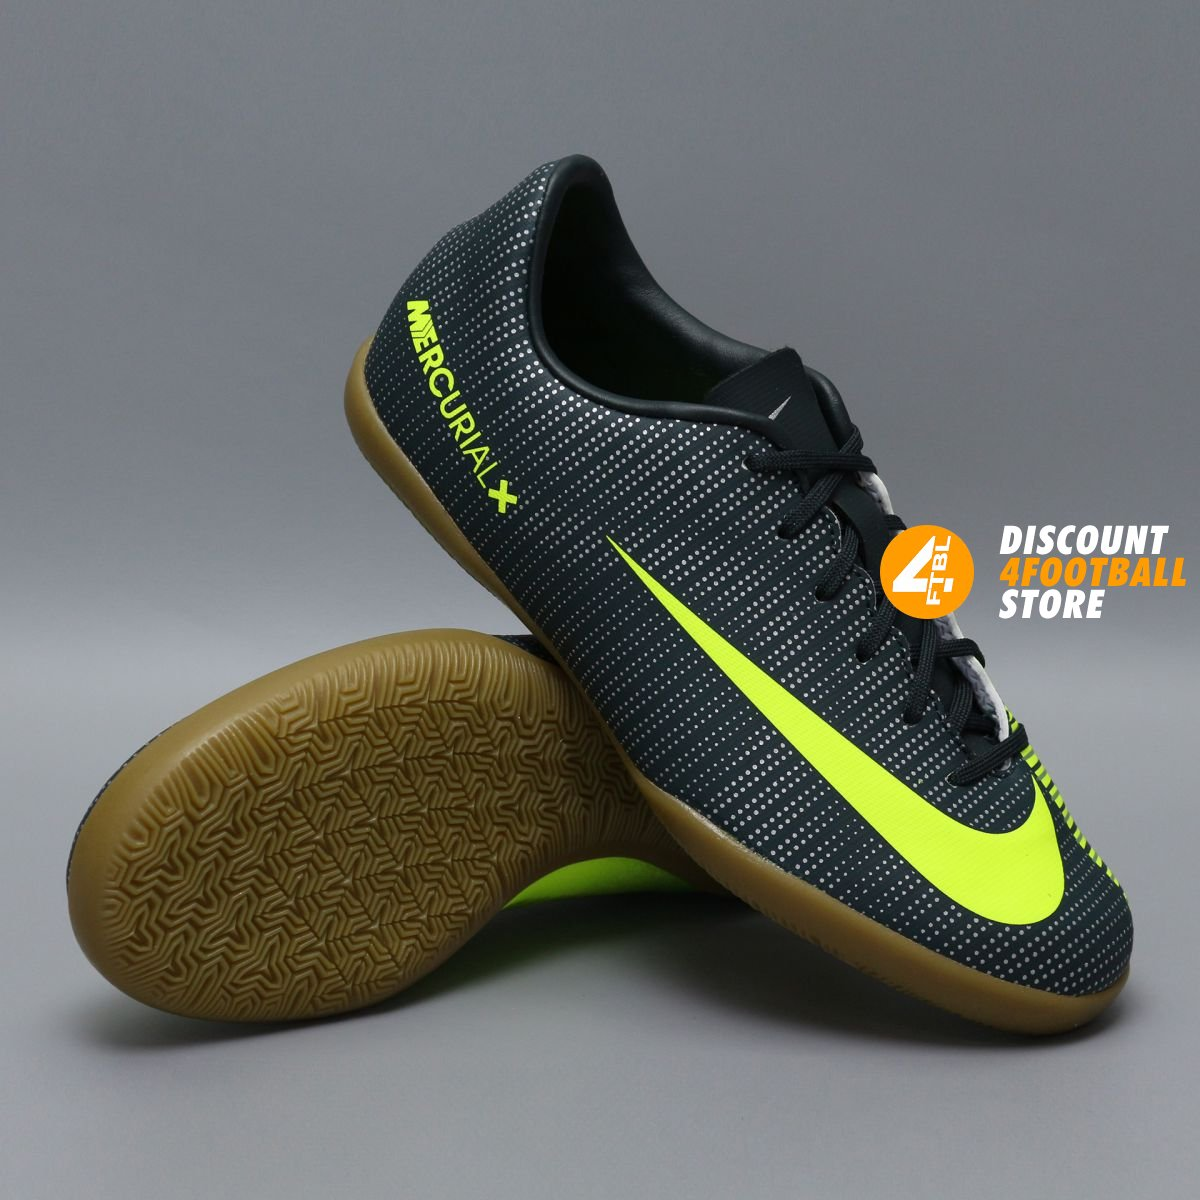 b443de04682d Детские футзалки Nike Ronaldo CR7 JR MERCURIALX VAPOR XI IC   852488-376